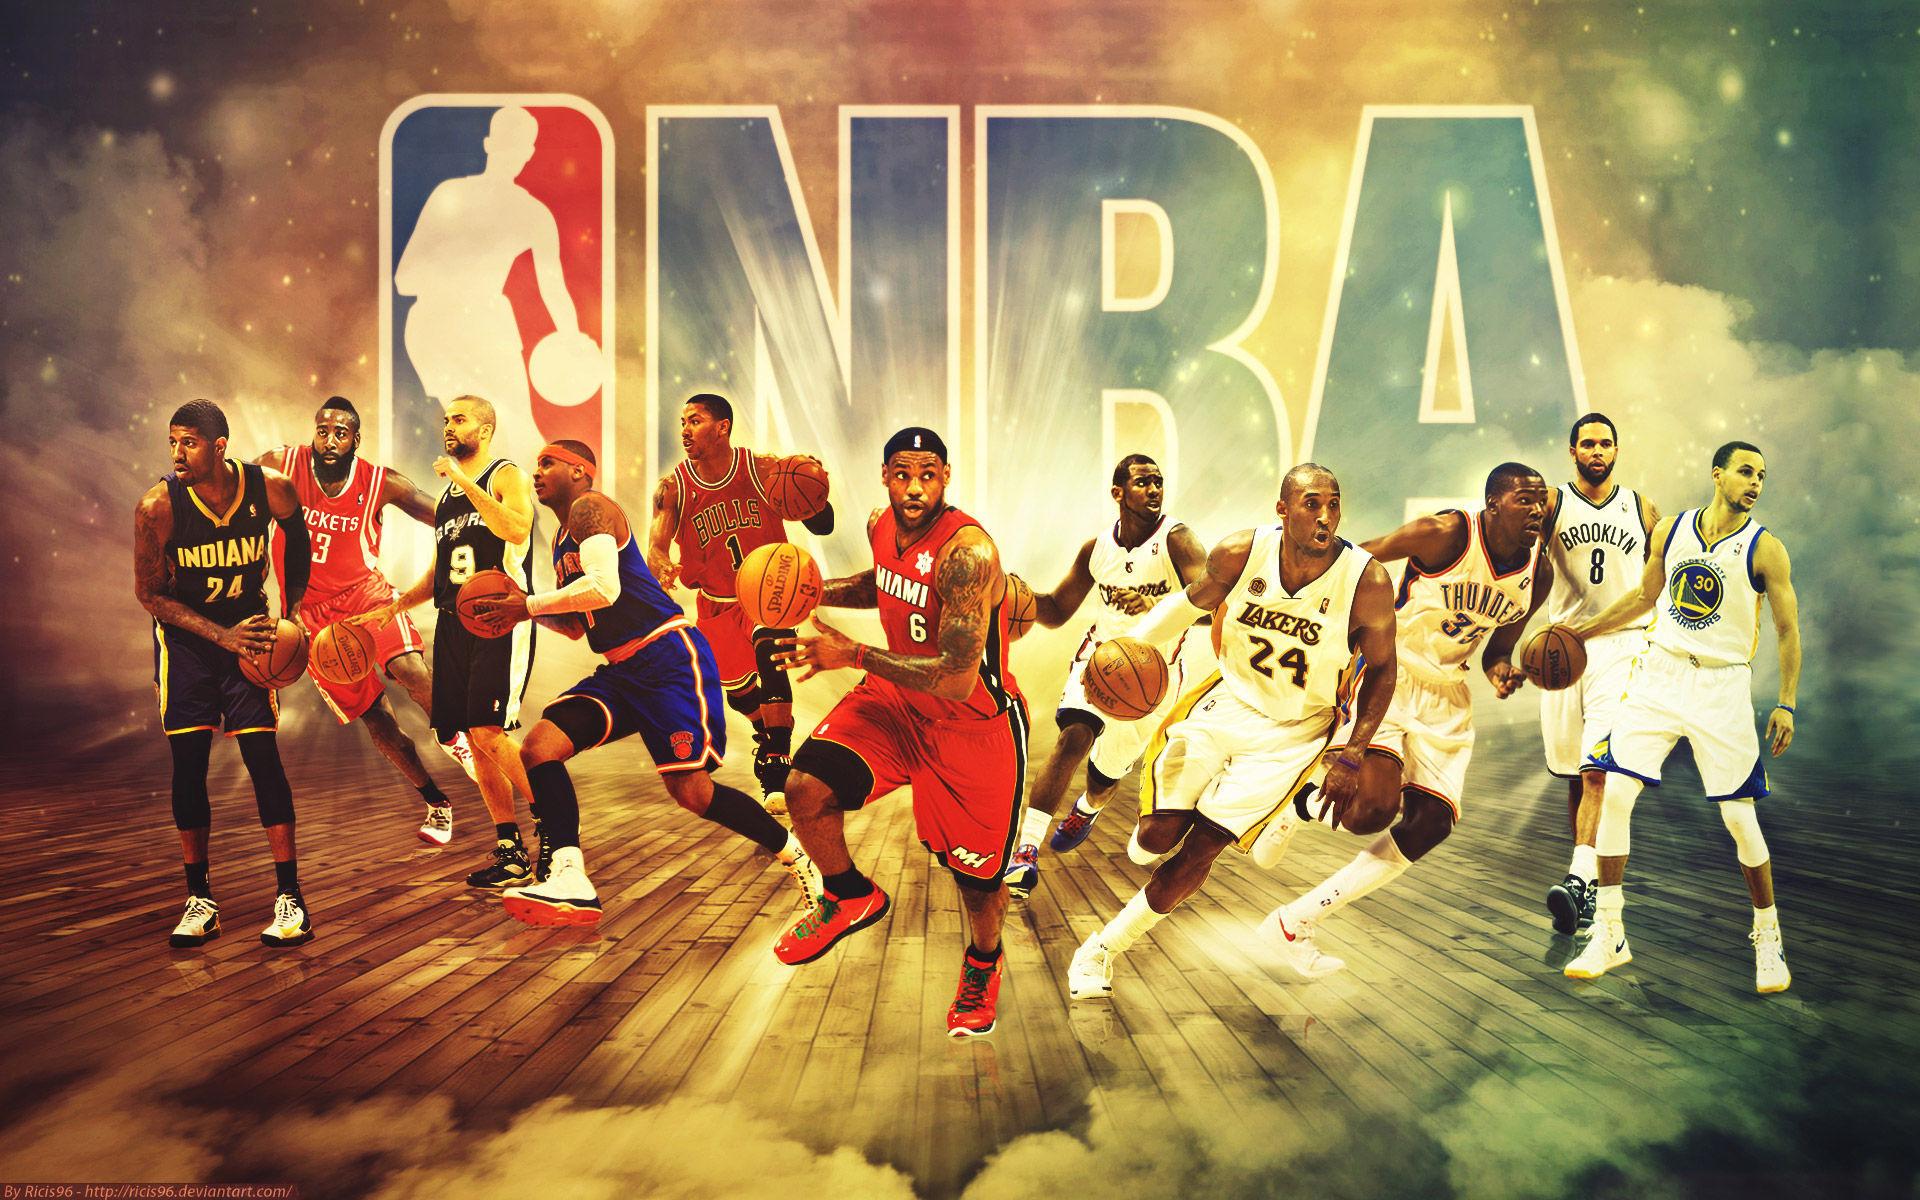 6779 - Jugadores NBA, si te sacan de los famosos, ¿cuántos conocerás?